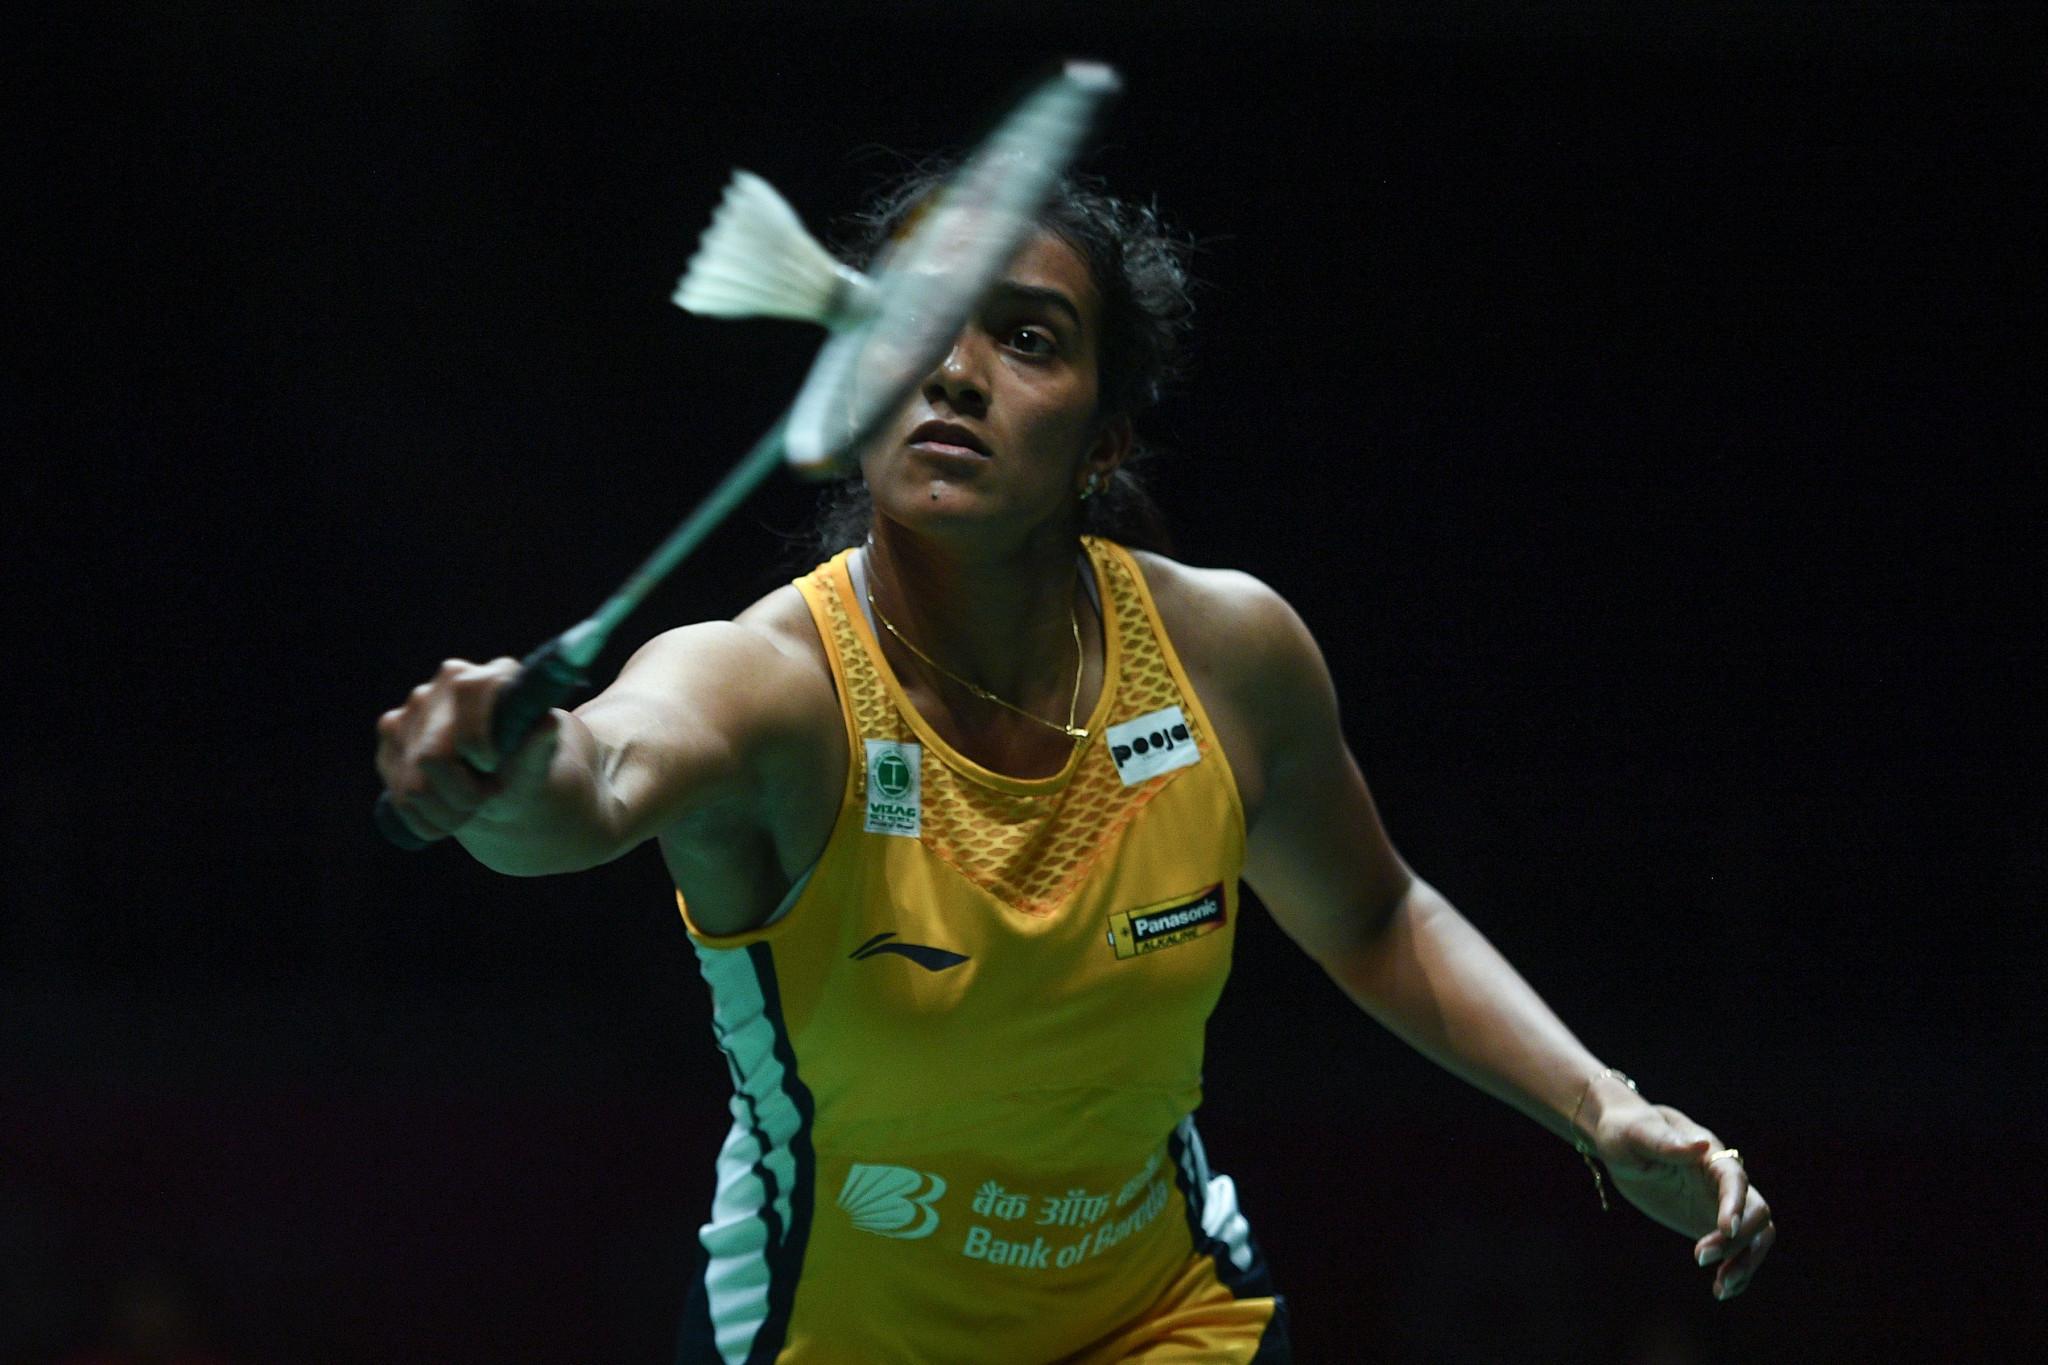 Badminton world champion Sindhu moves to new training venue to aid Tokyo 2020 preparations